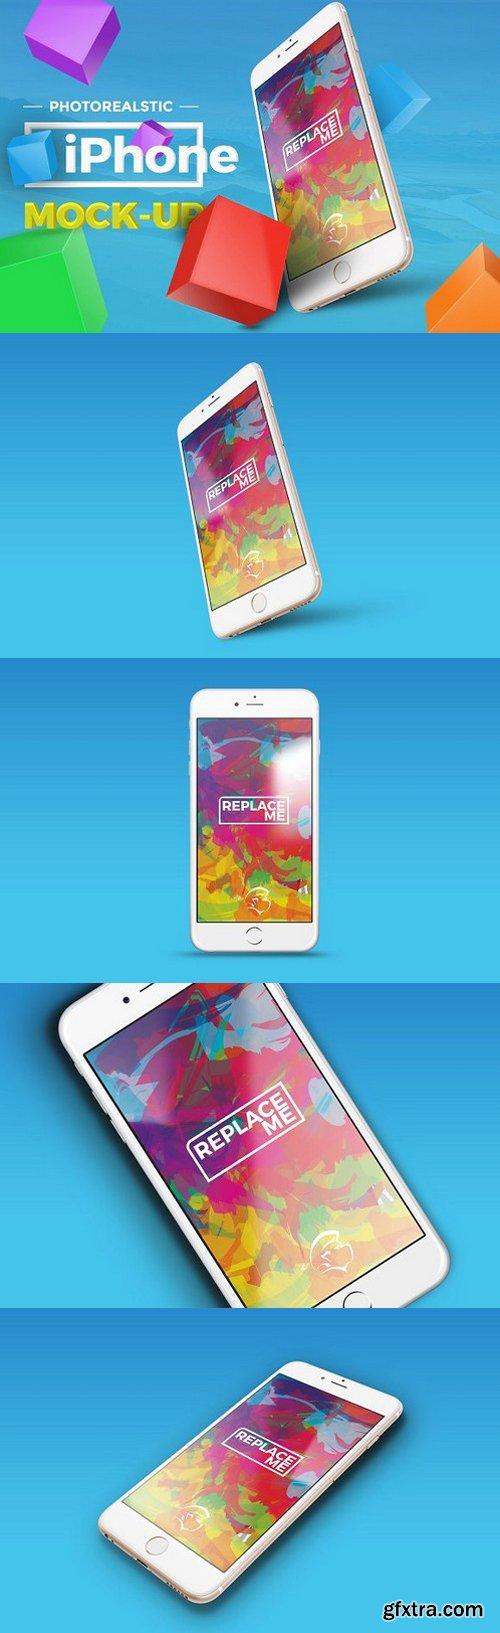 CM - 4 Photorealistic iPhone Mock-up 1080752